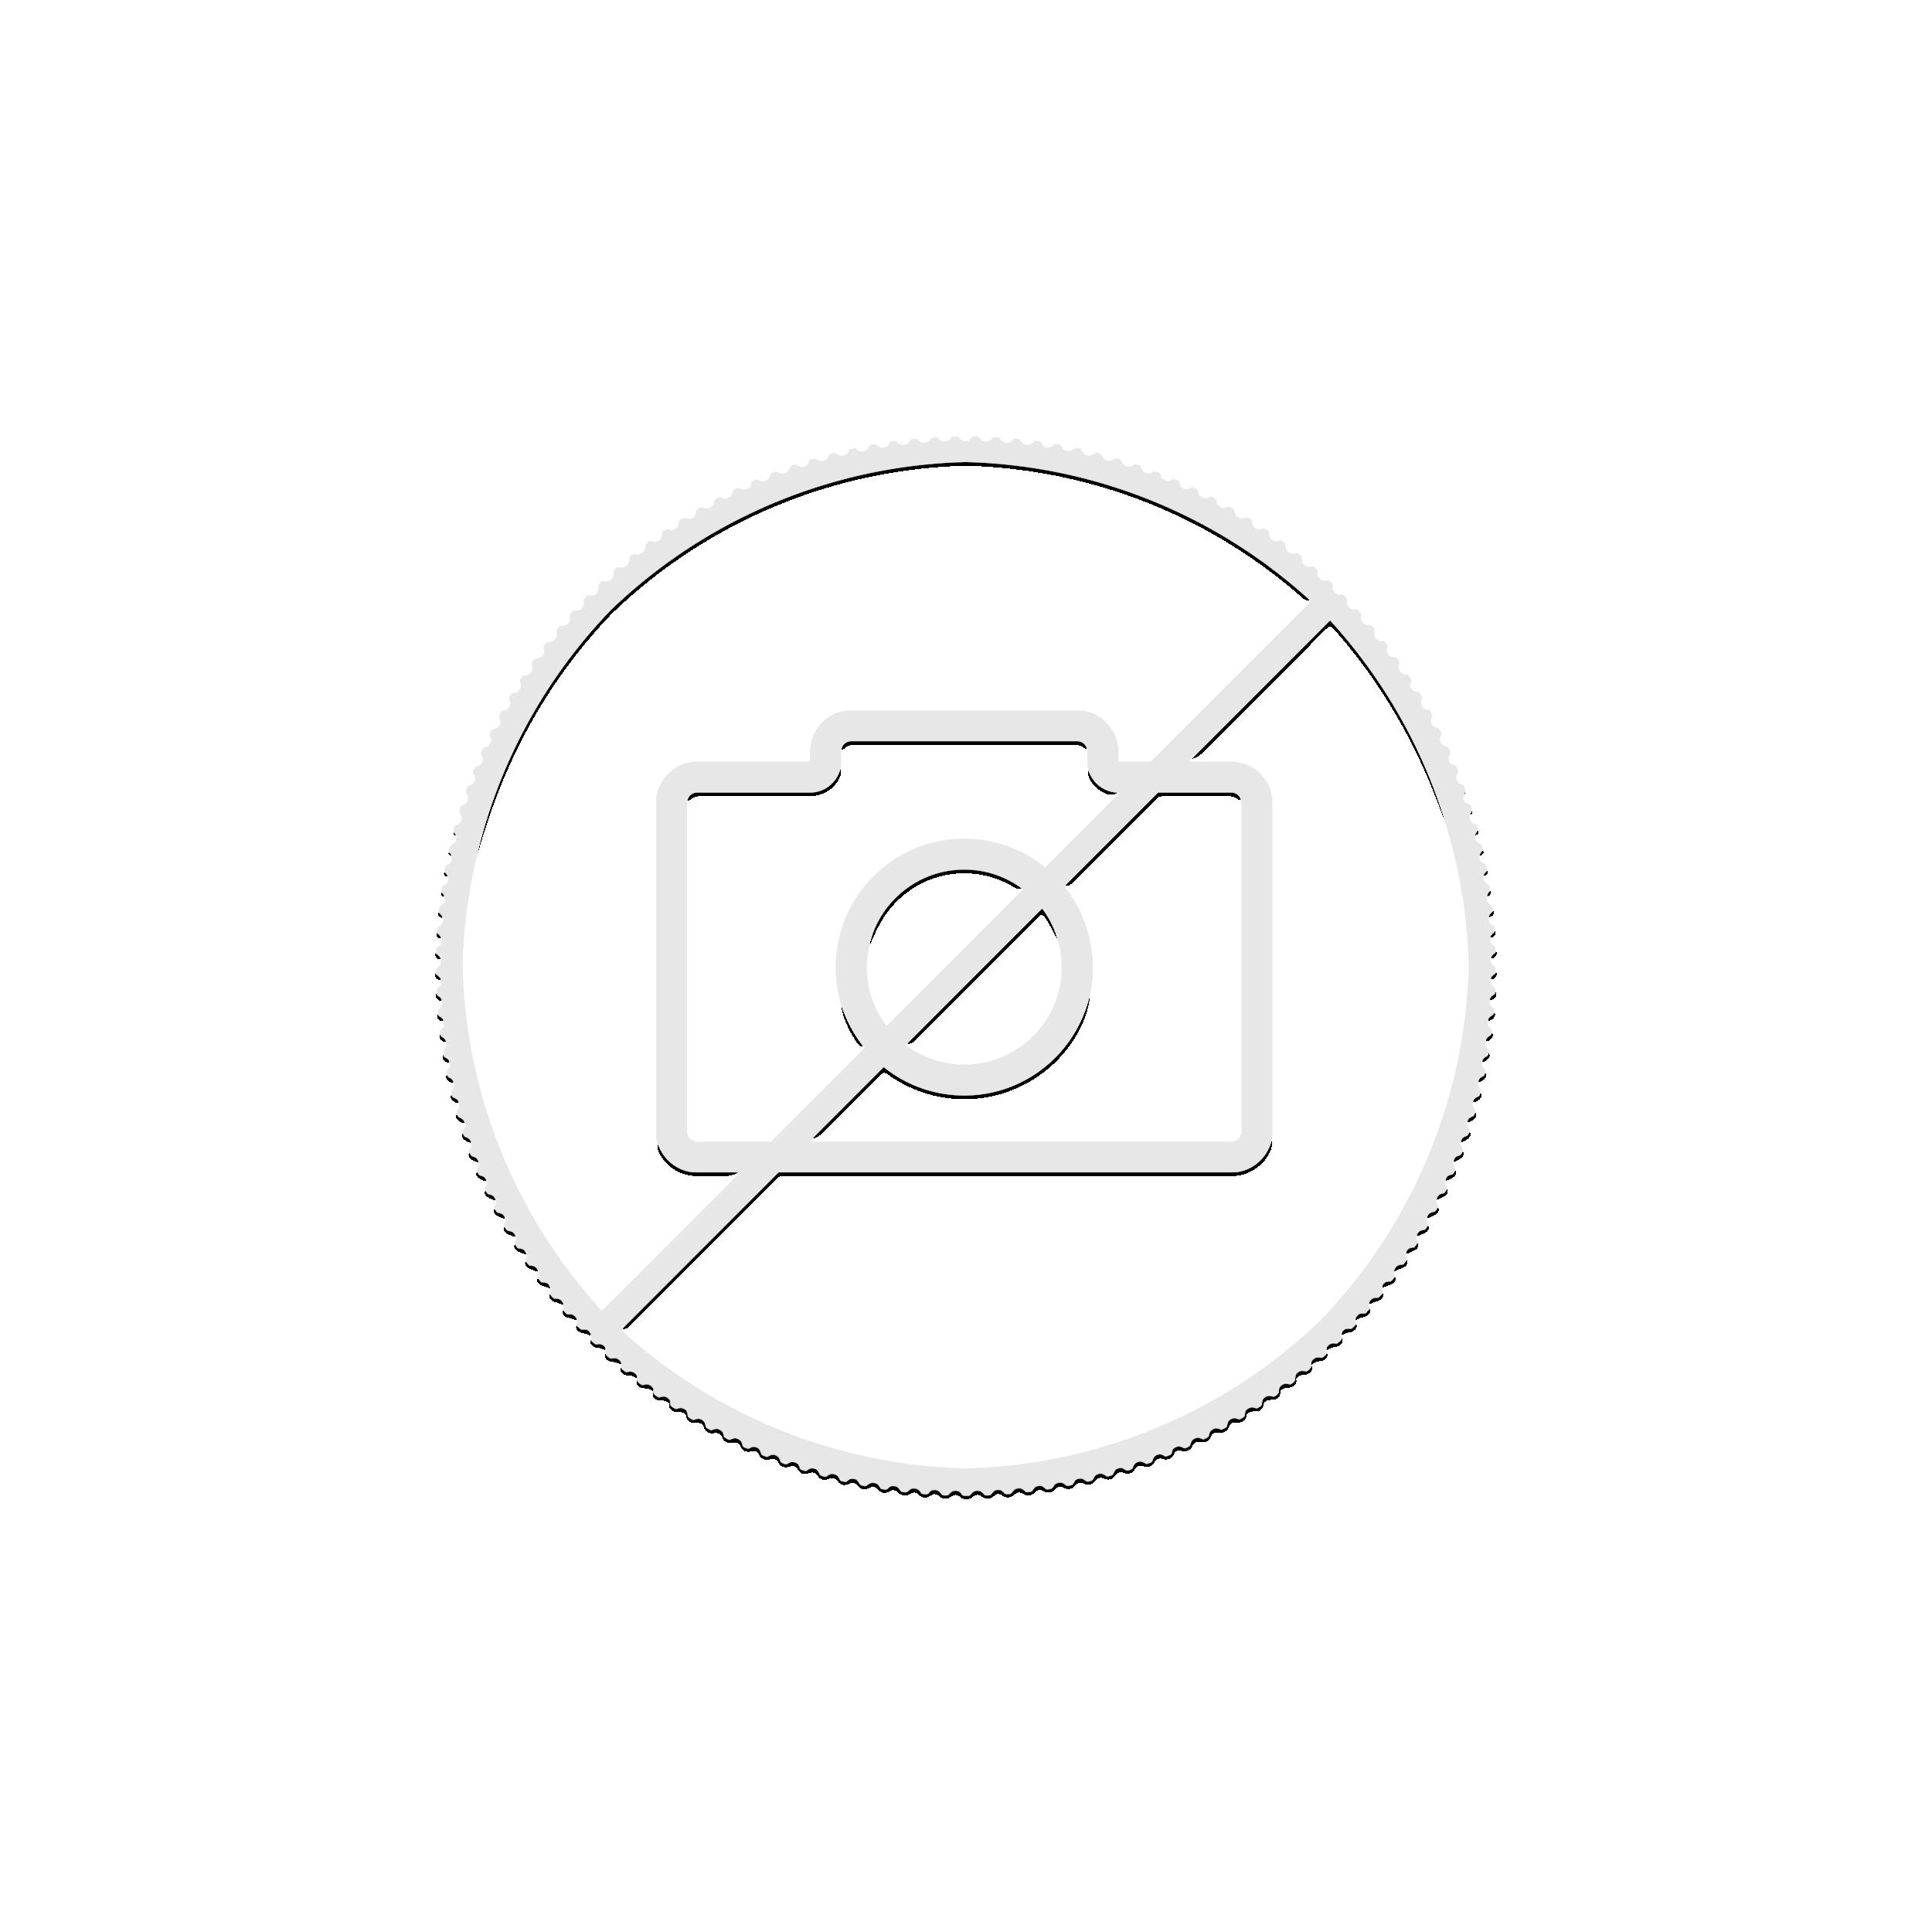 1 troy ounce zilveren munt Saint-Helena engel verguld 2021